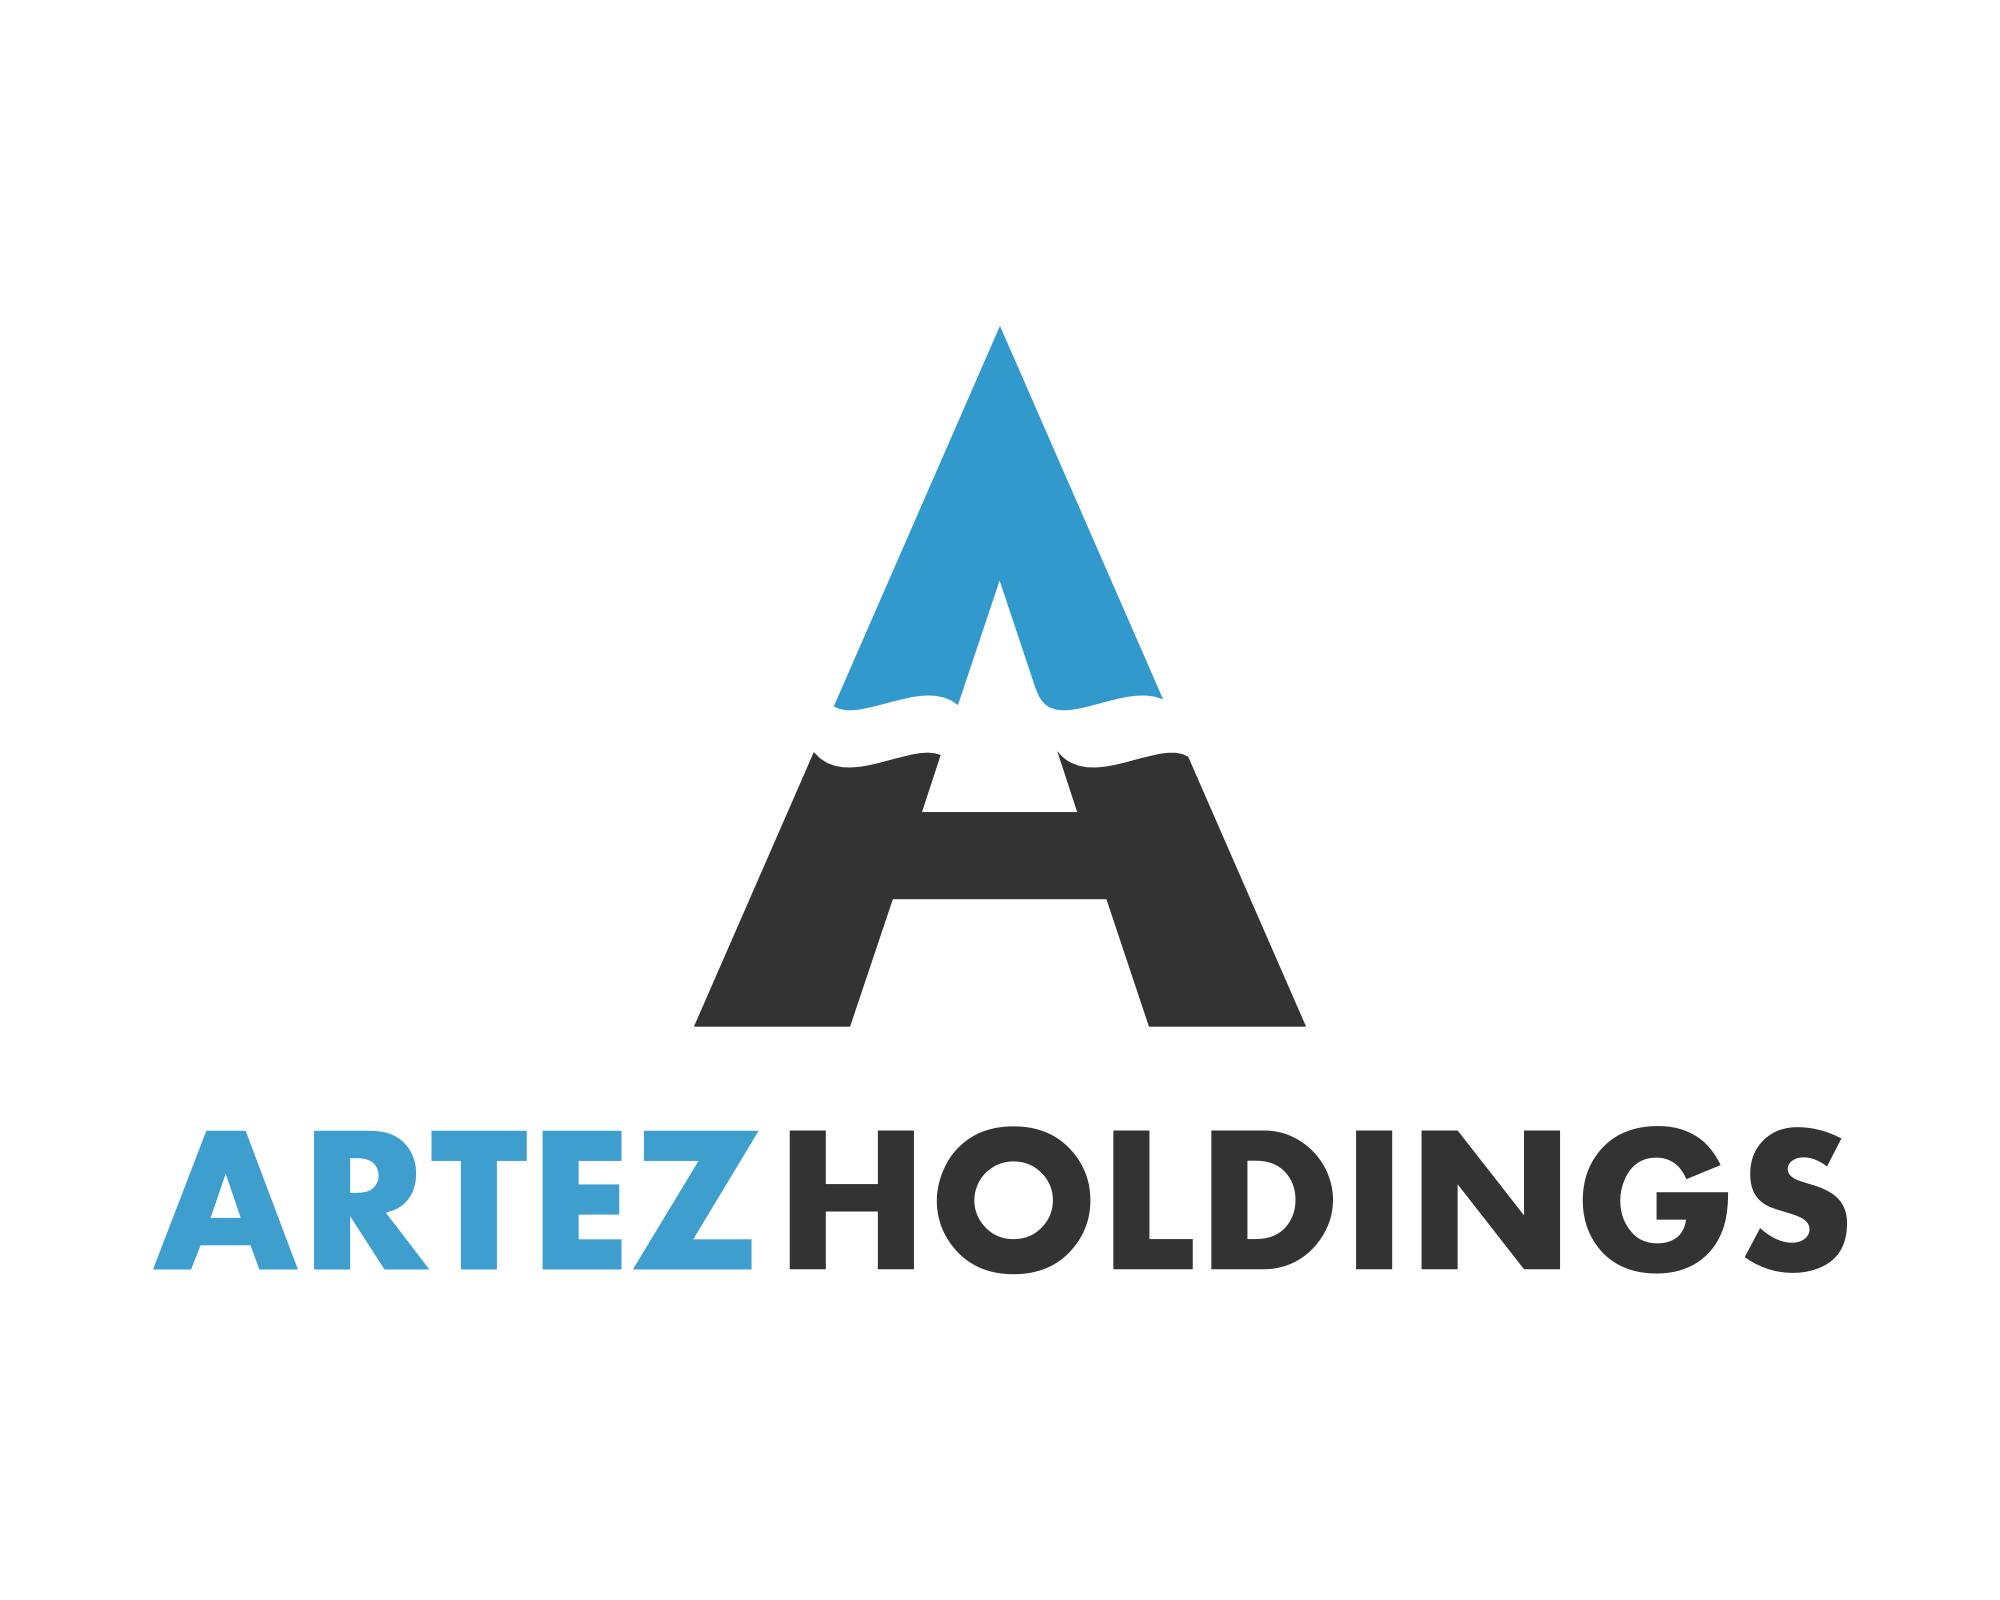 Logo Design by explogos - Entry No. 13 in the Logo Design Contest New Logo Design for Artez Holdings.